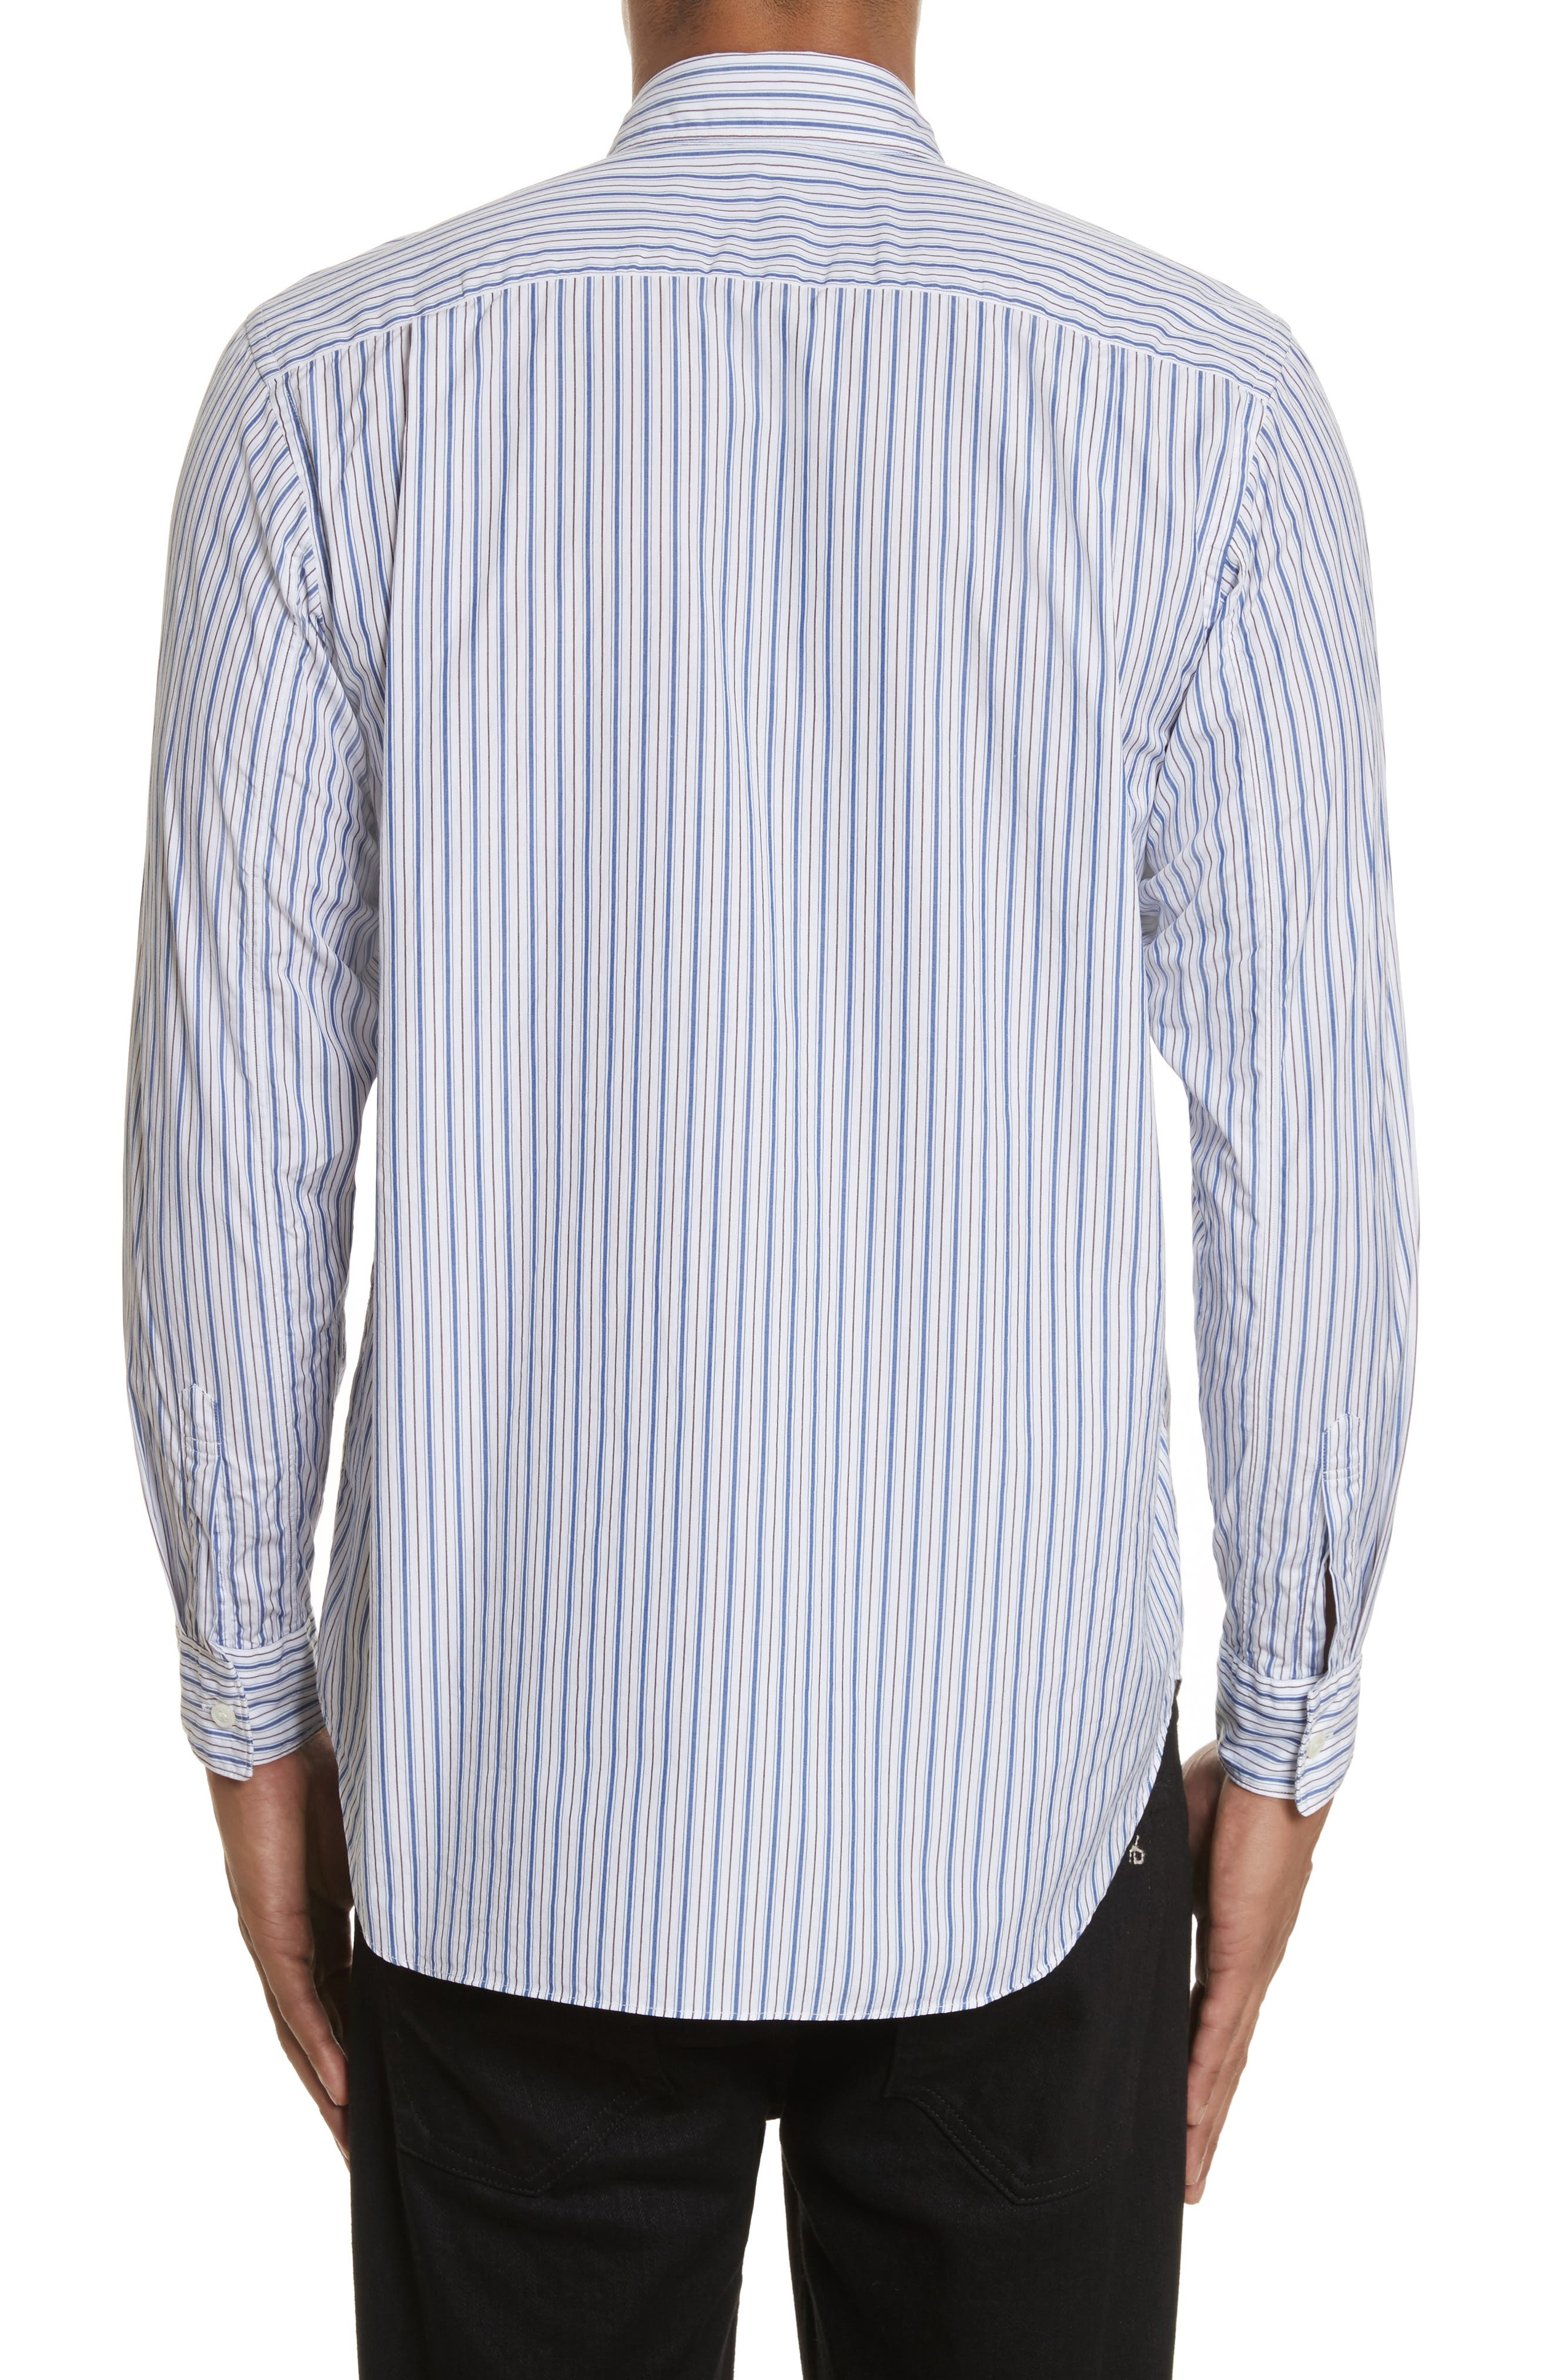 PLAY Black Heart Stripe Oxford Shirt,                             Alternate thumbnail 2, color,                             Blue